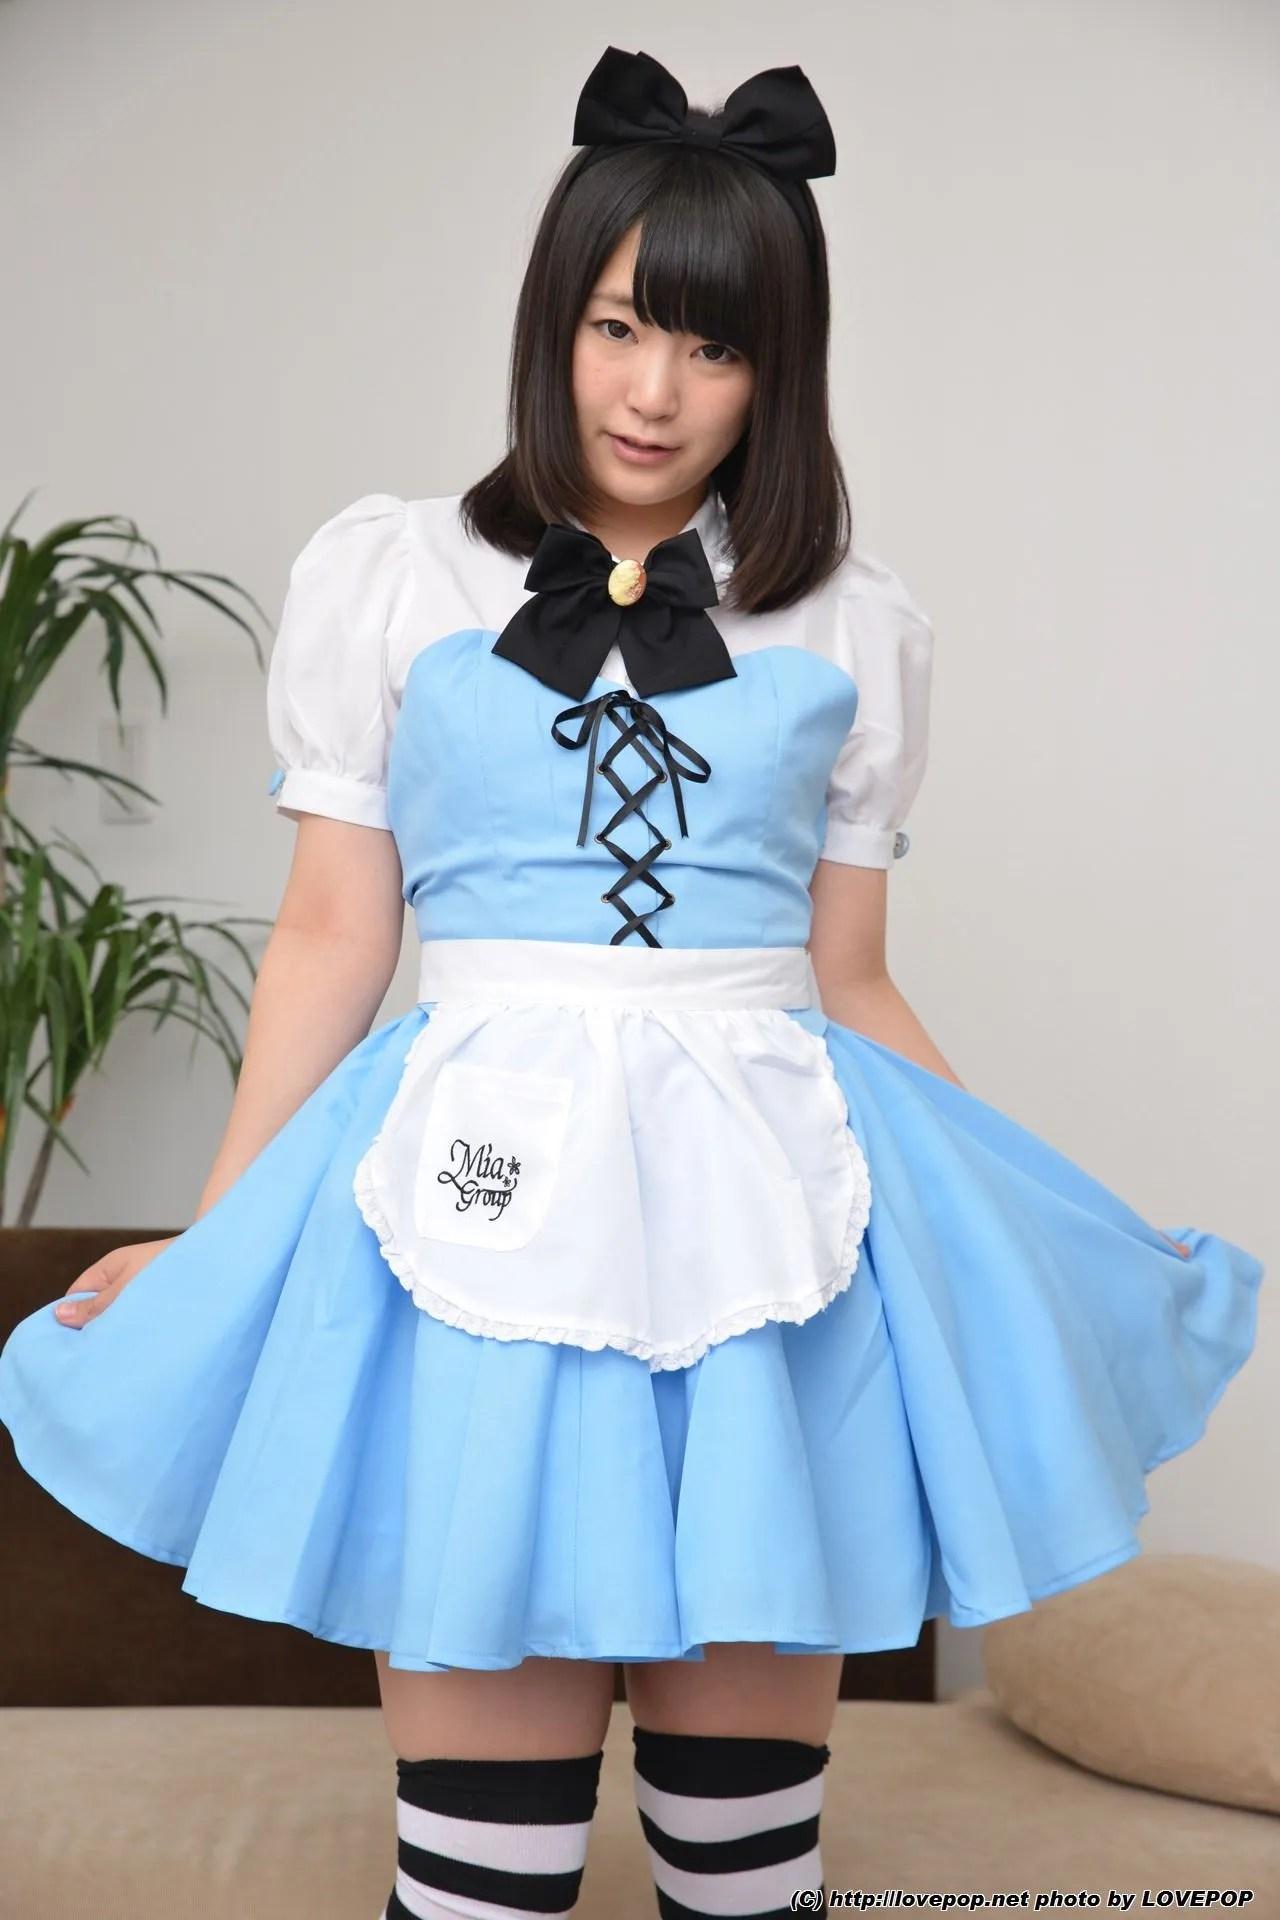 [LovePop] Tsuna Kimura 木村つな Maid Set03 写真集[65P]插图(2)